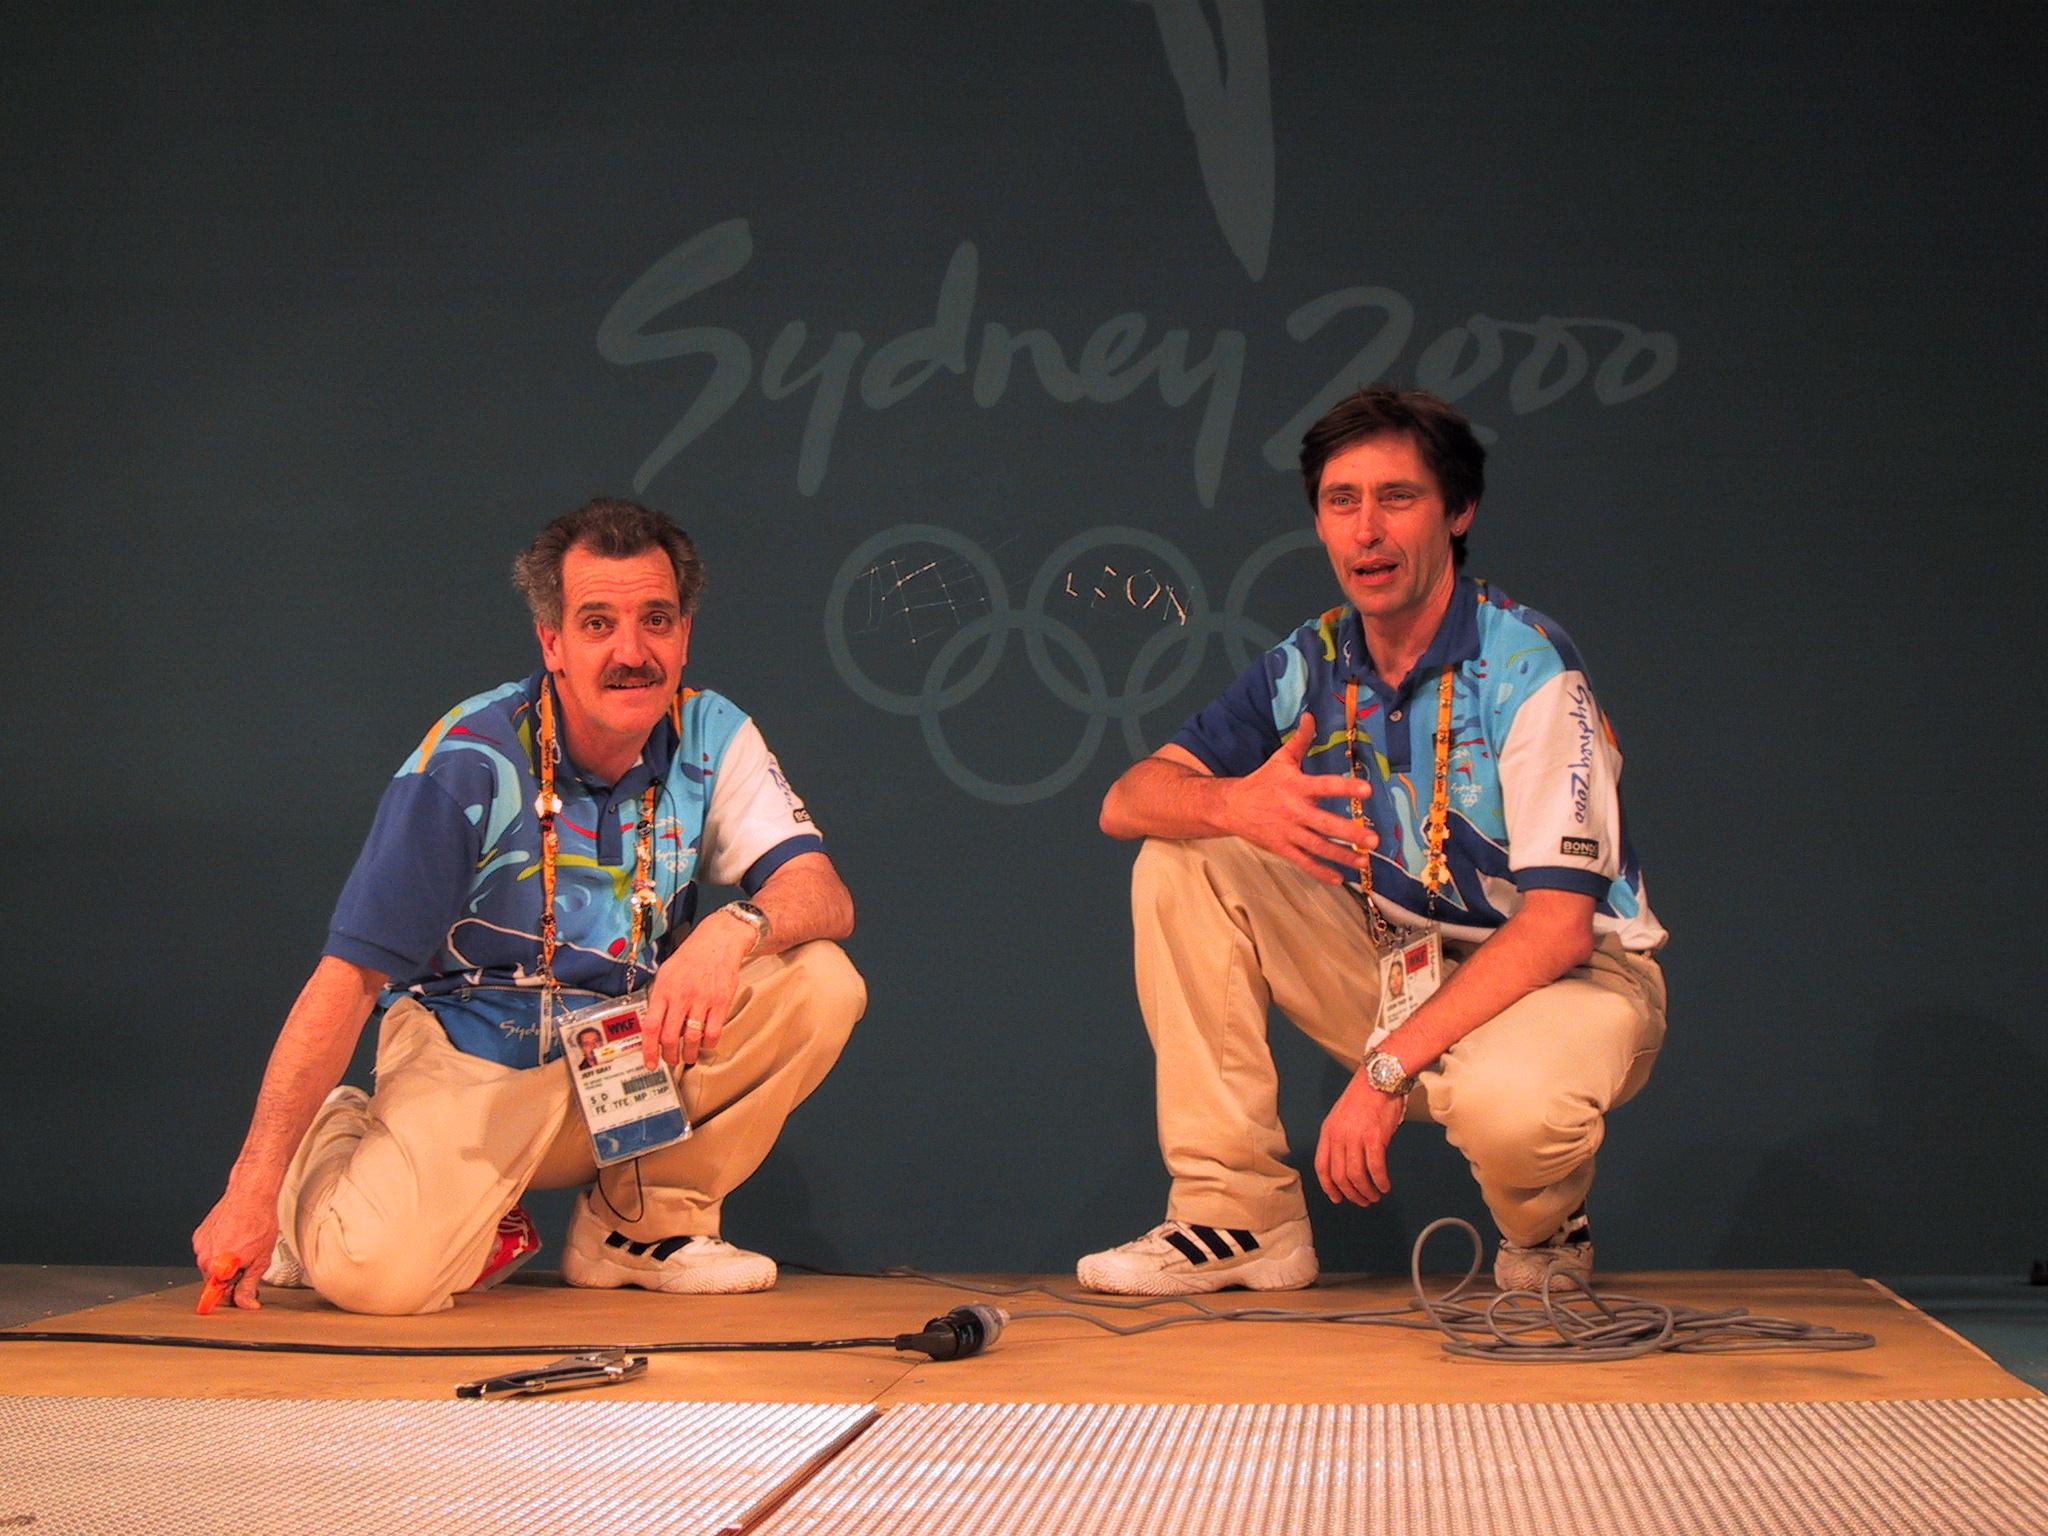 Sydney 2000 Olympics Jeff and Leon leave their mark